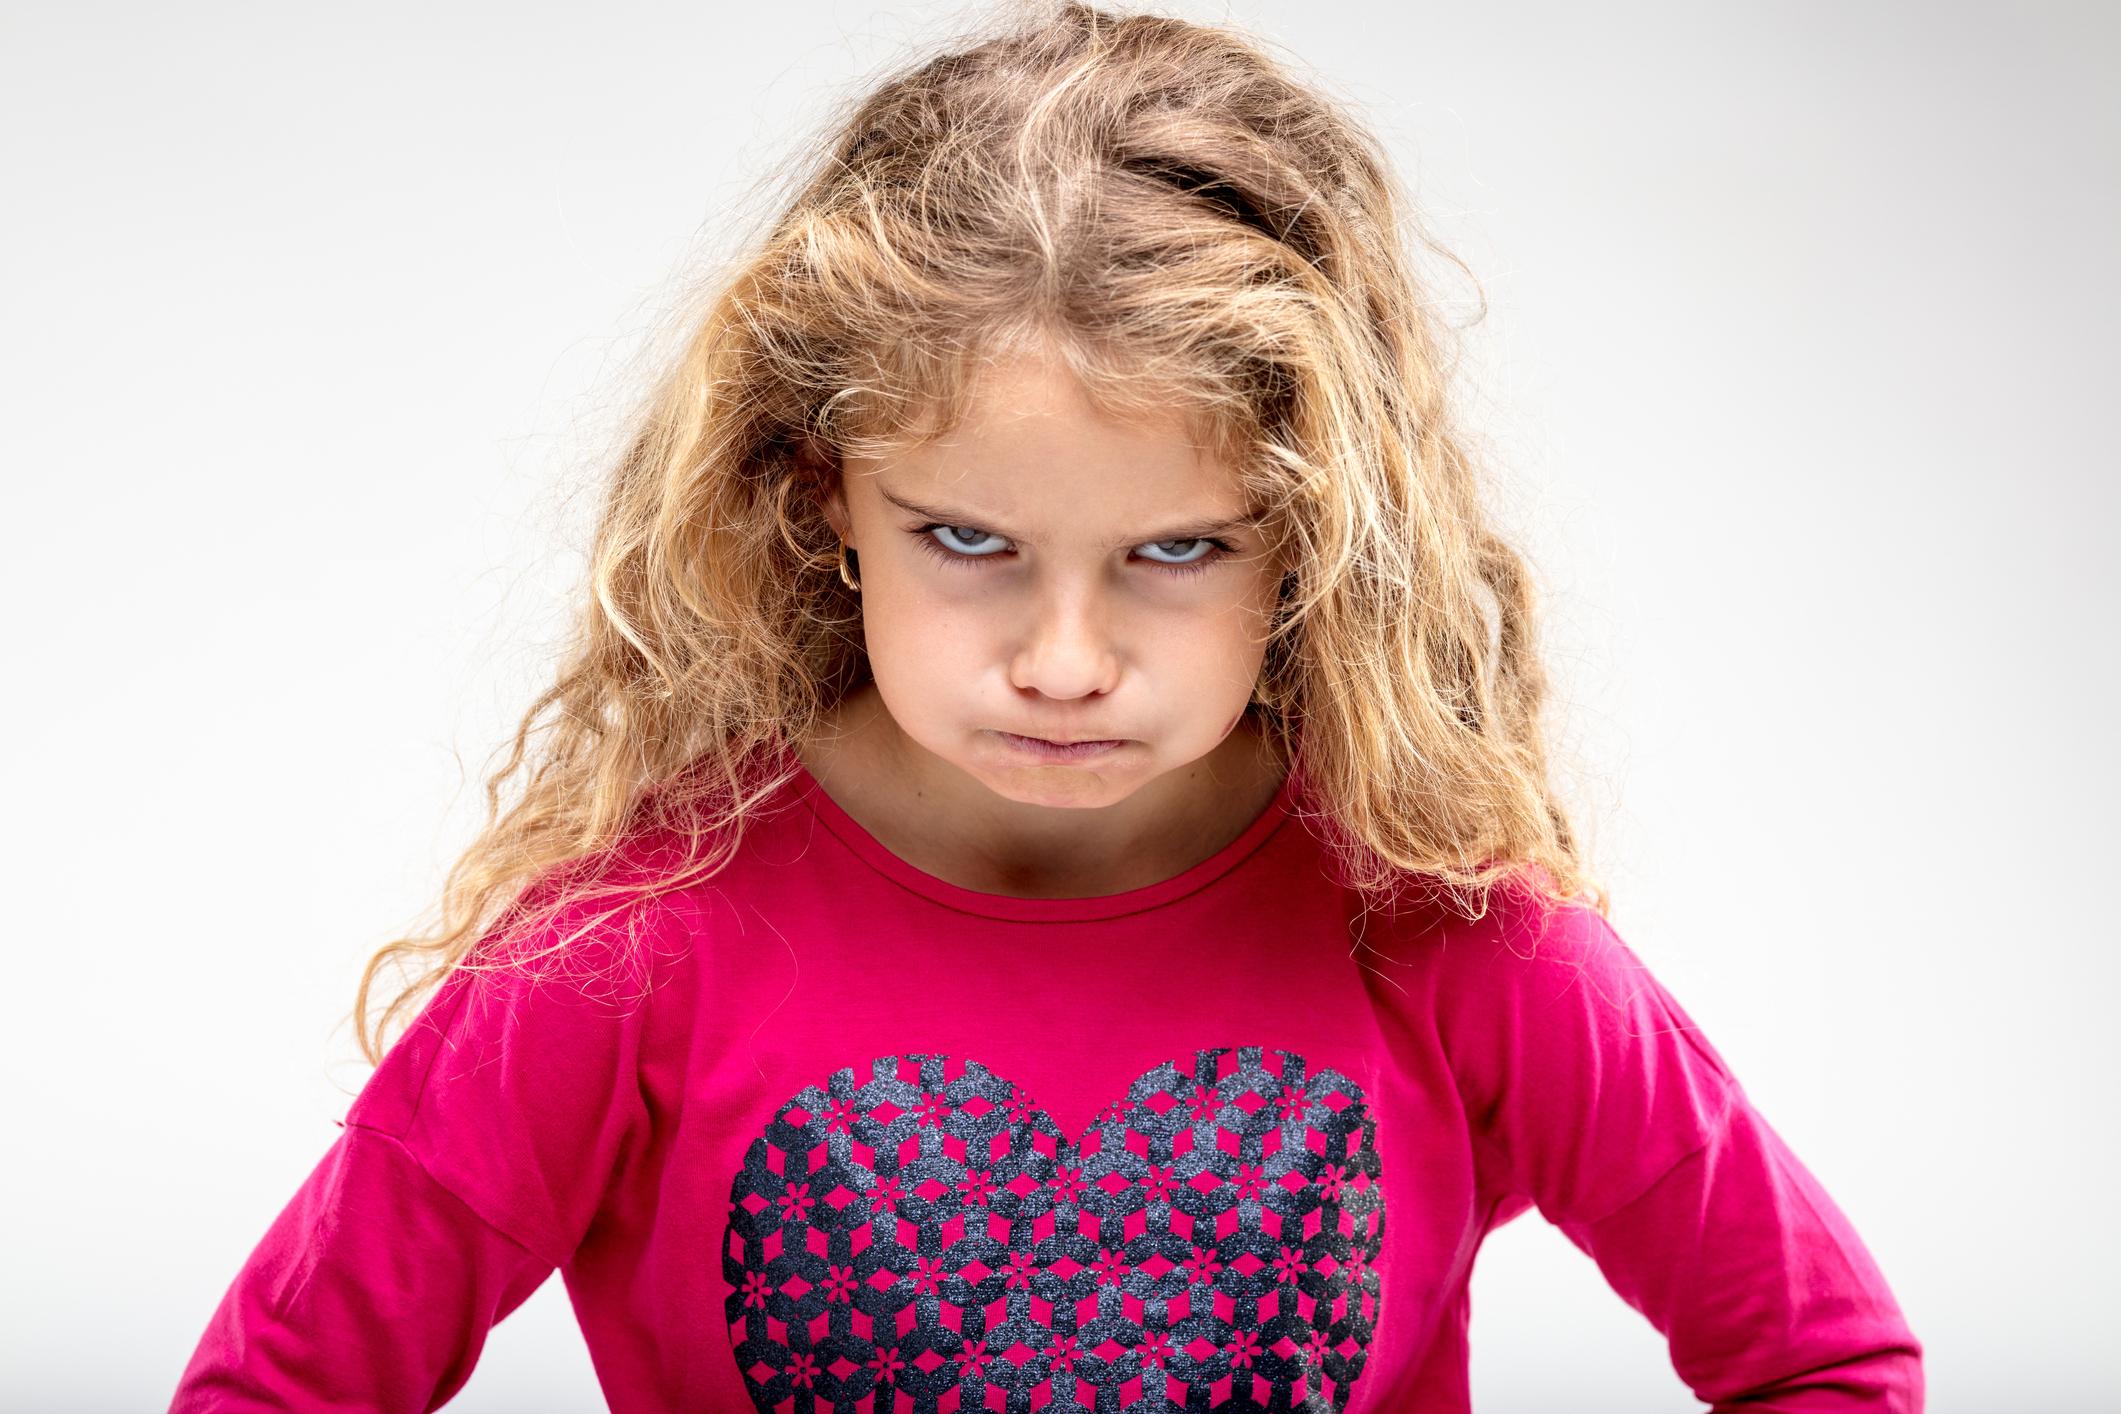 Childhood Temper Dysregulation